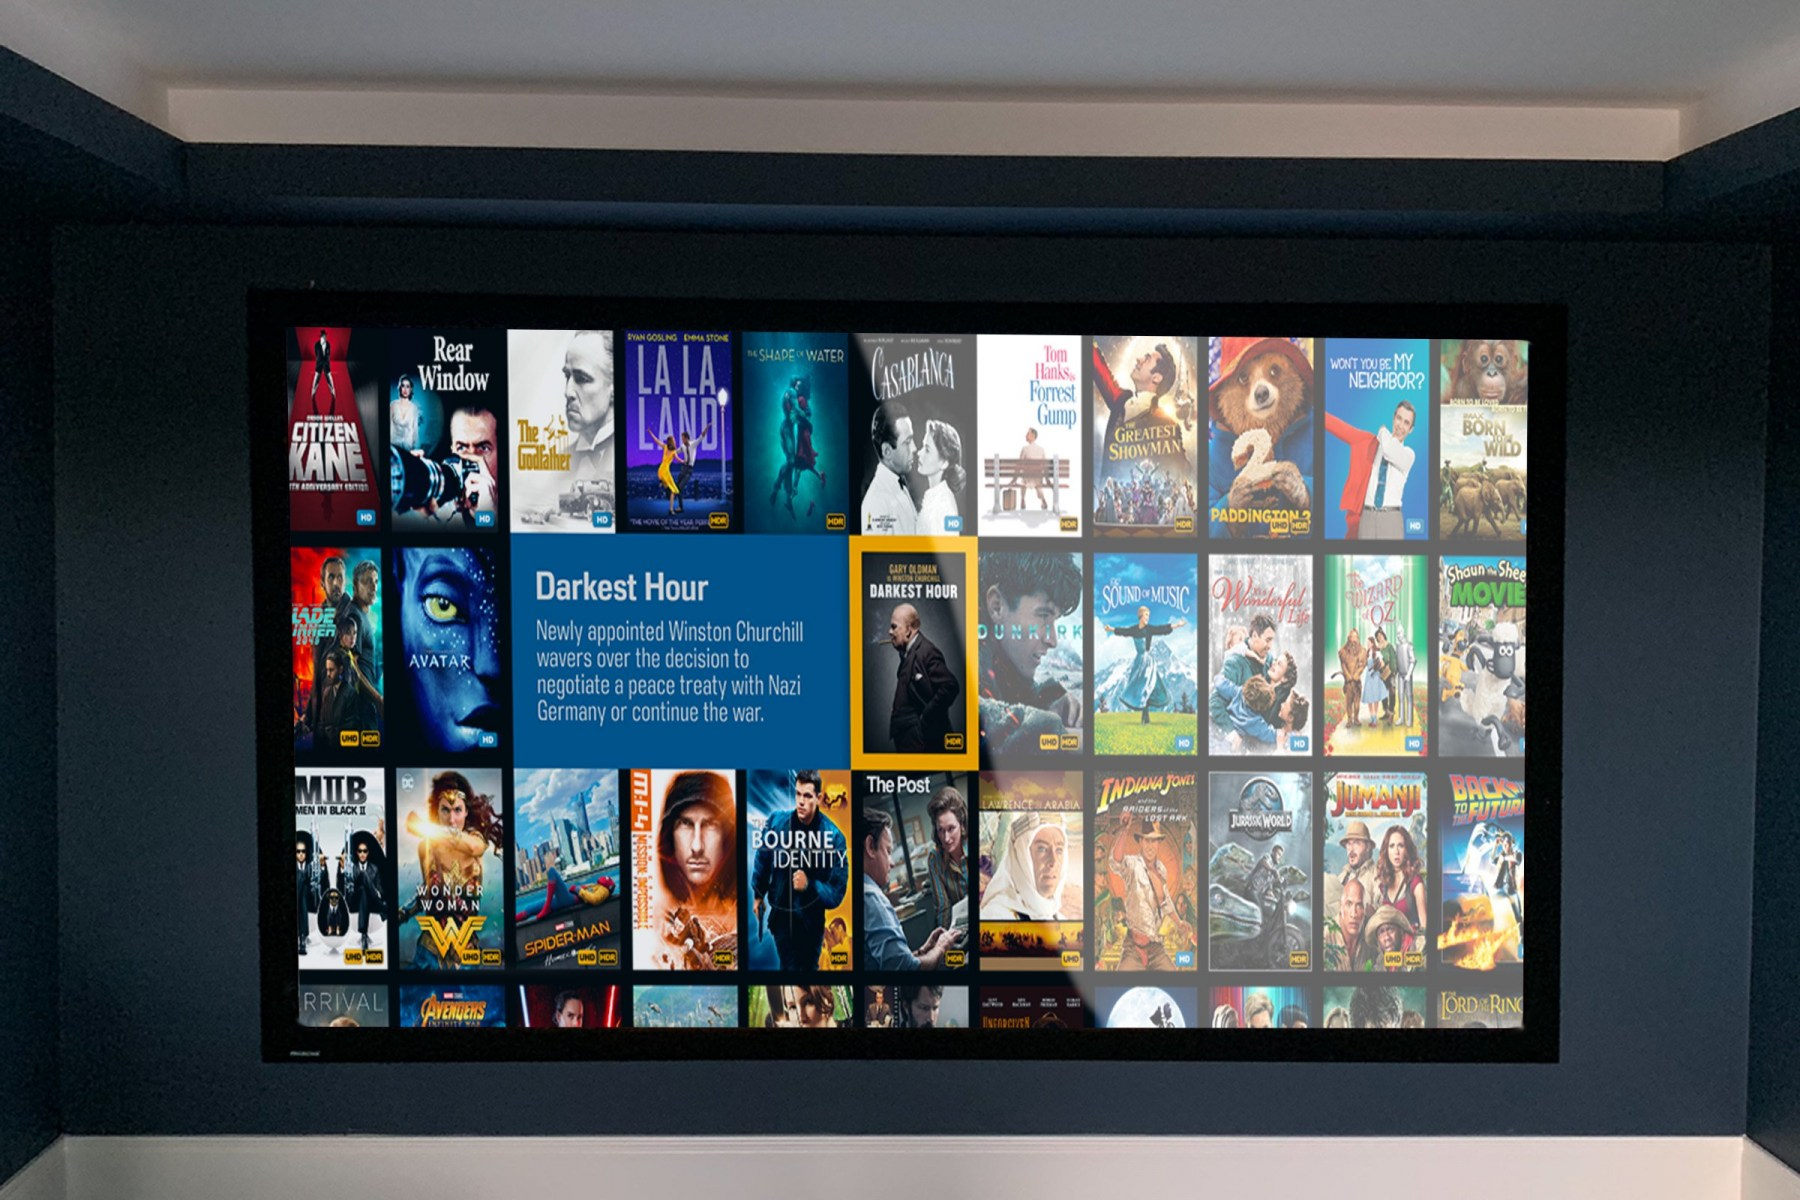 Kaleidescape movie server interface